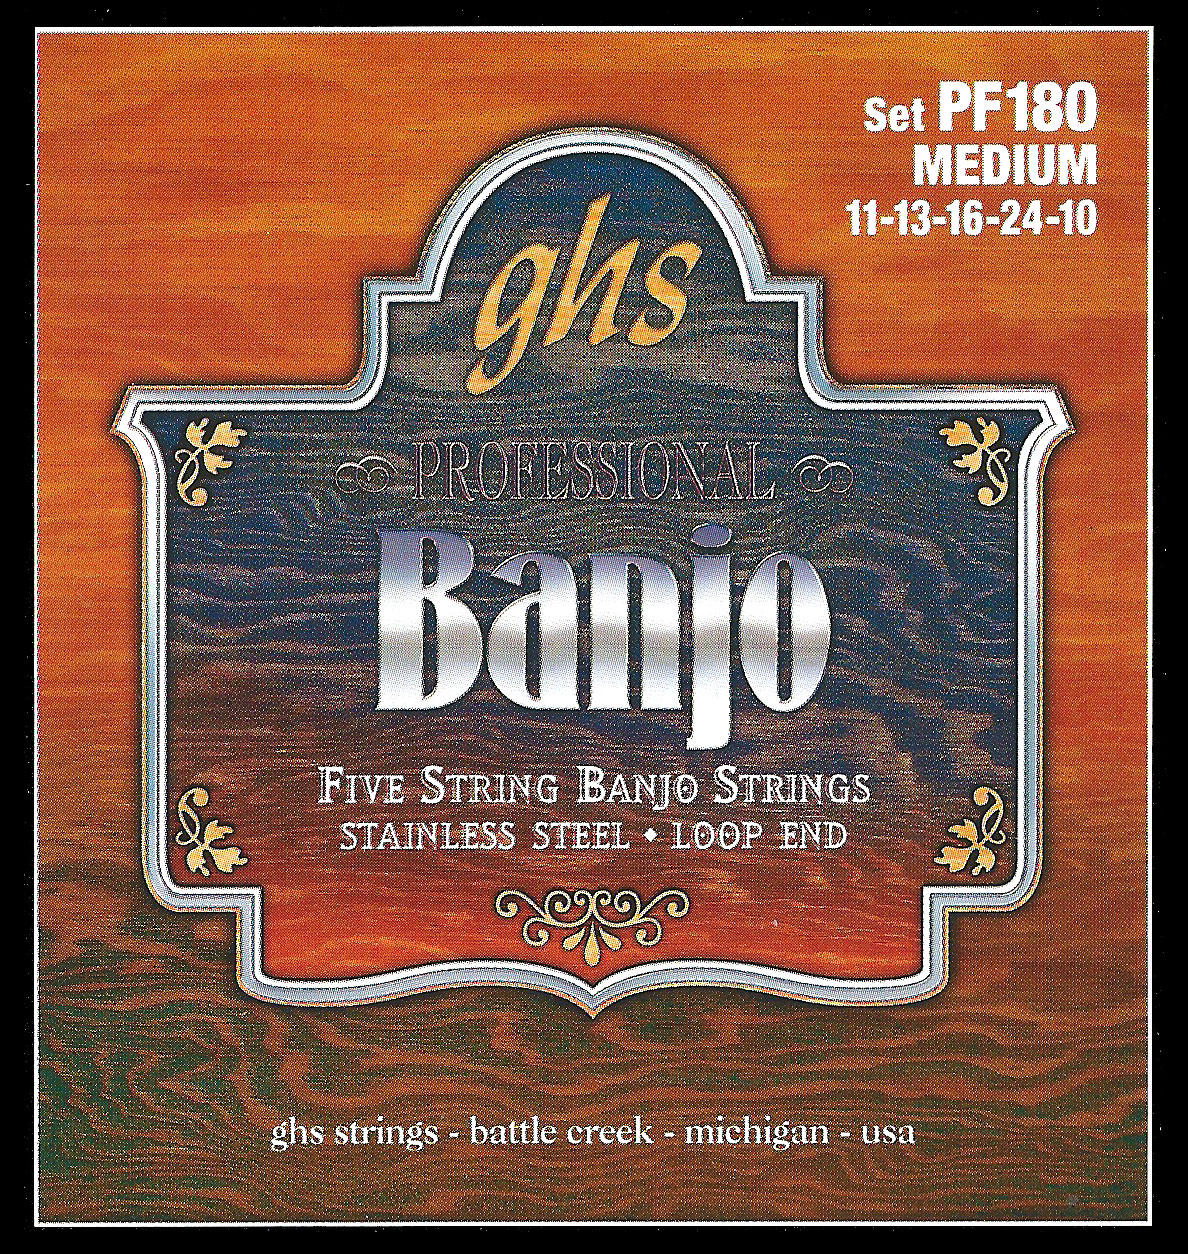 GHS PF180 STAINLESS STEEL 5-STRING - Stainless Steel Medium Banjo Strings